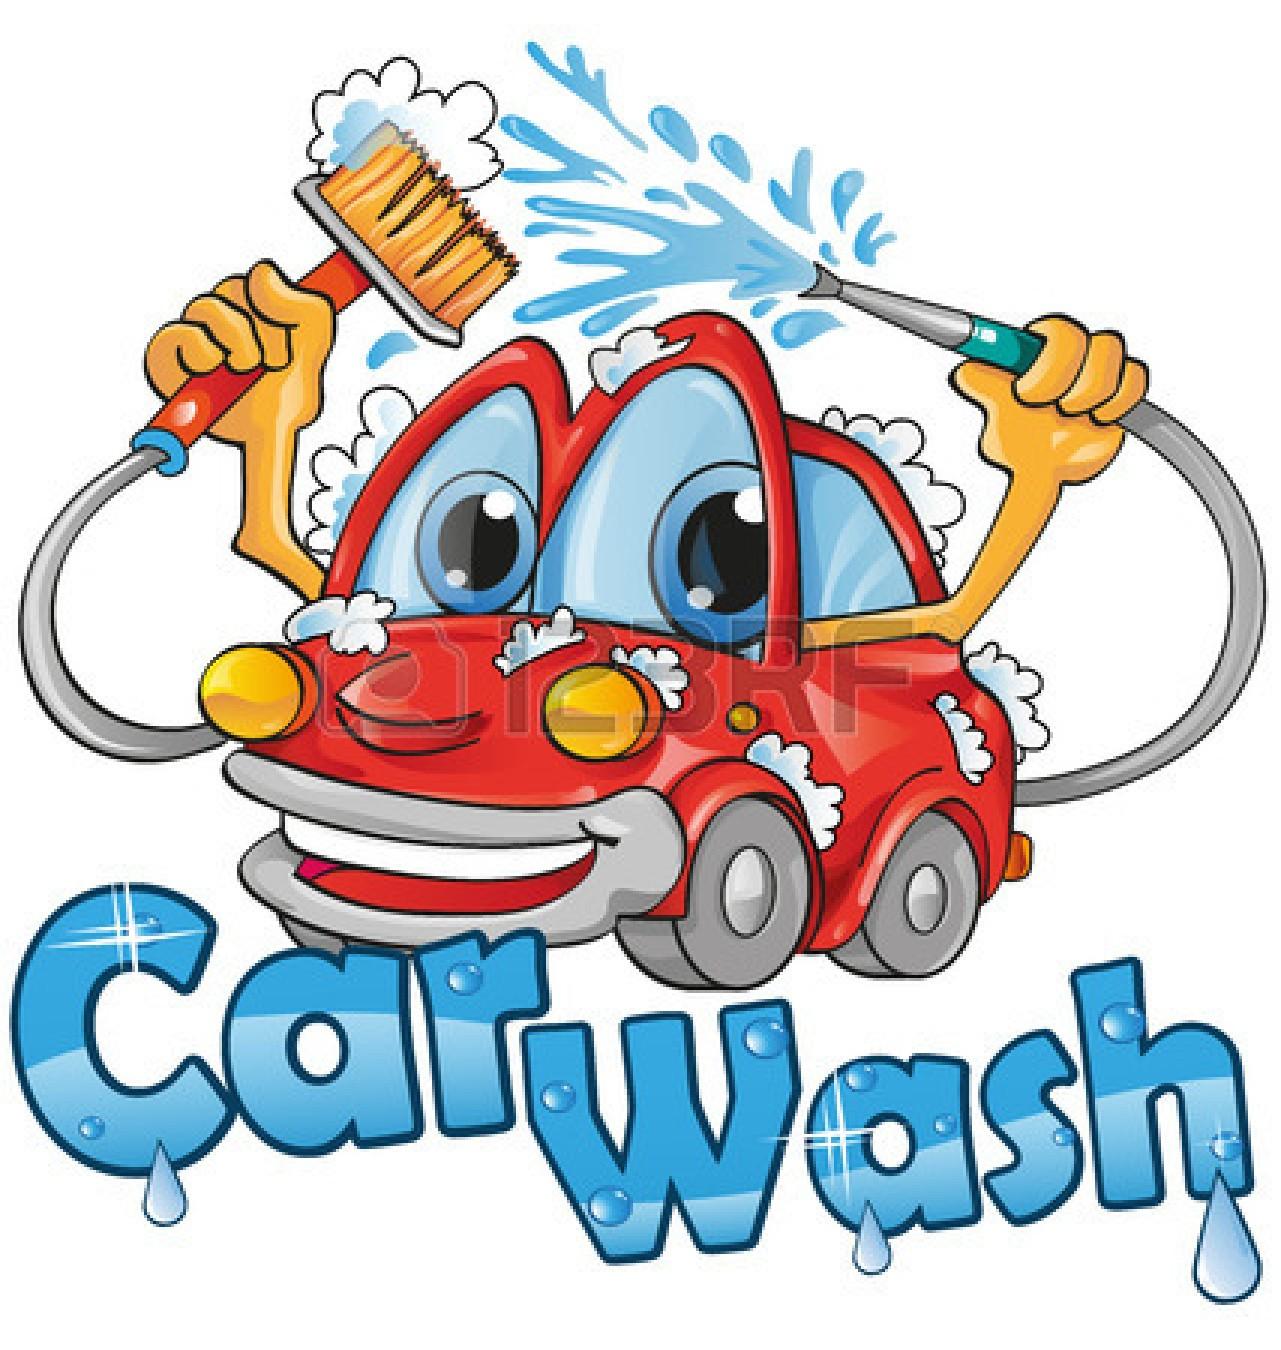 Cartoon Car Car Wash Service Cartoon Car Pictures Car Wash Service